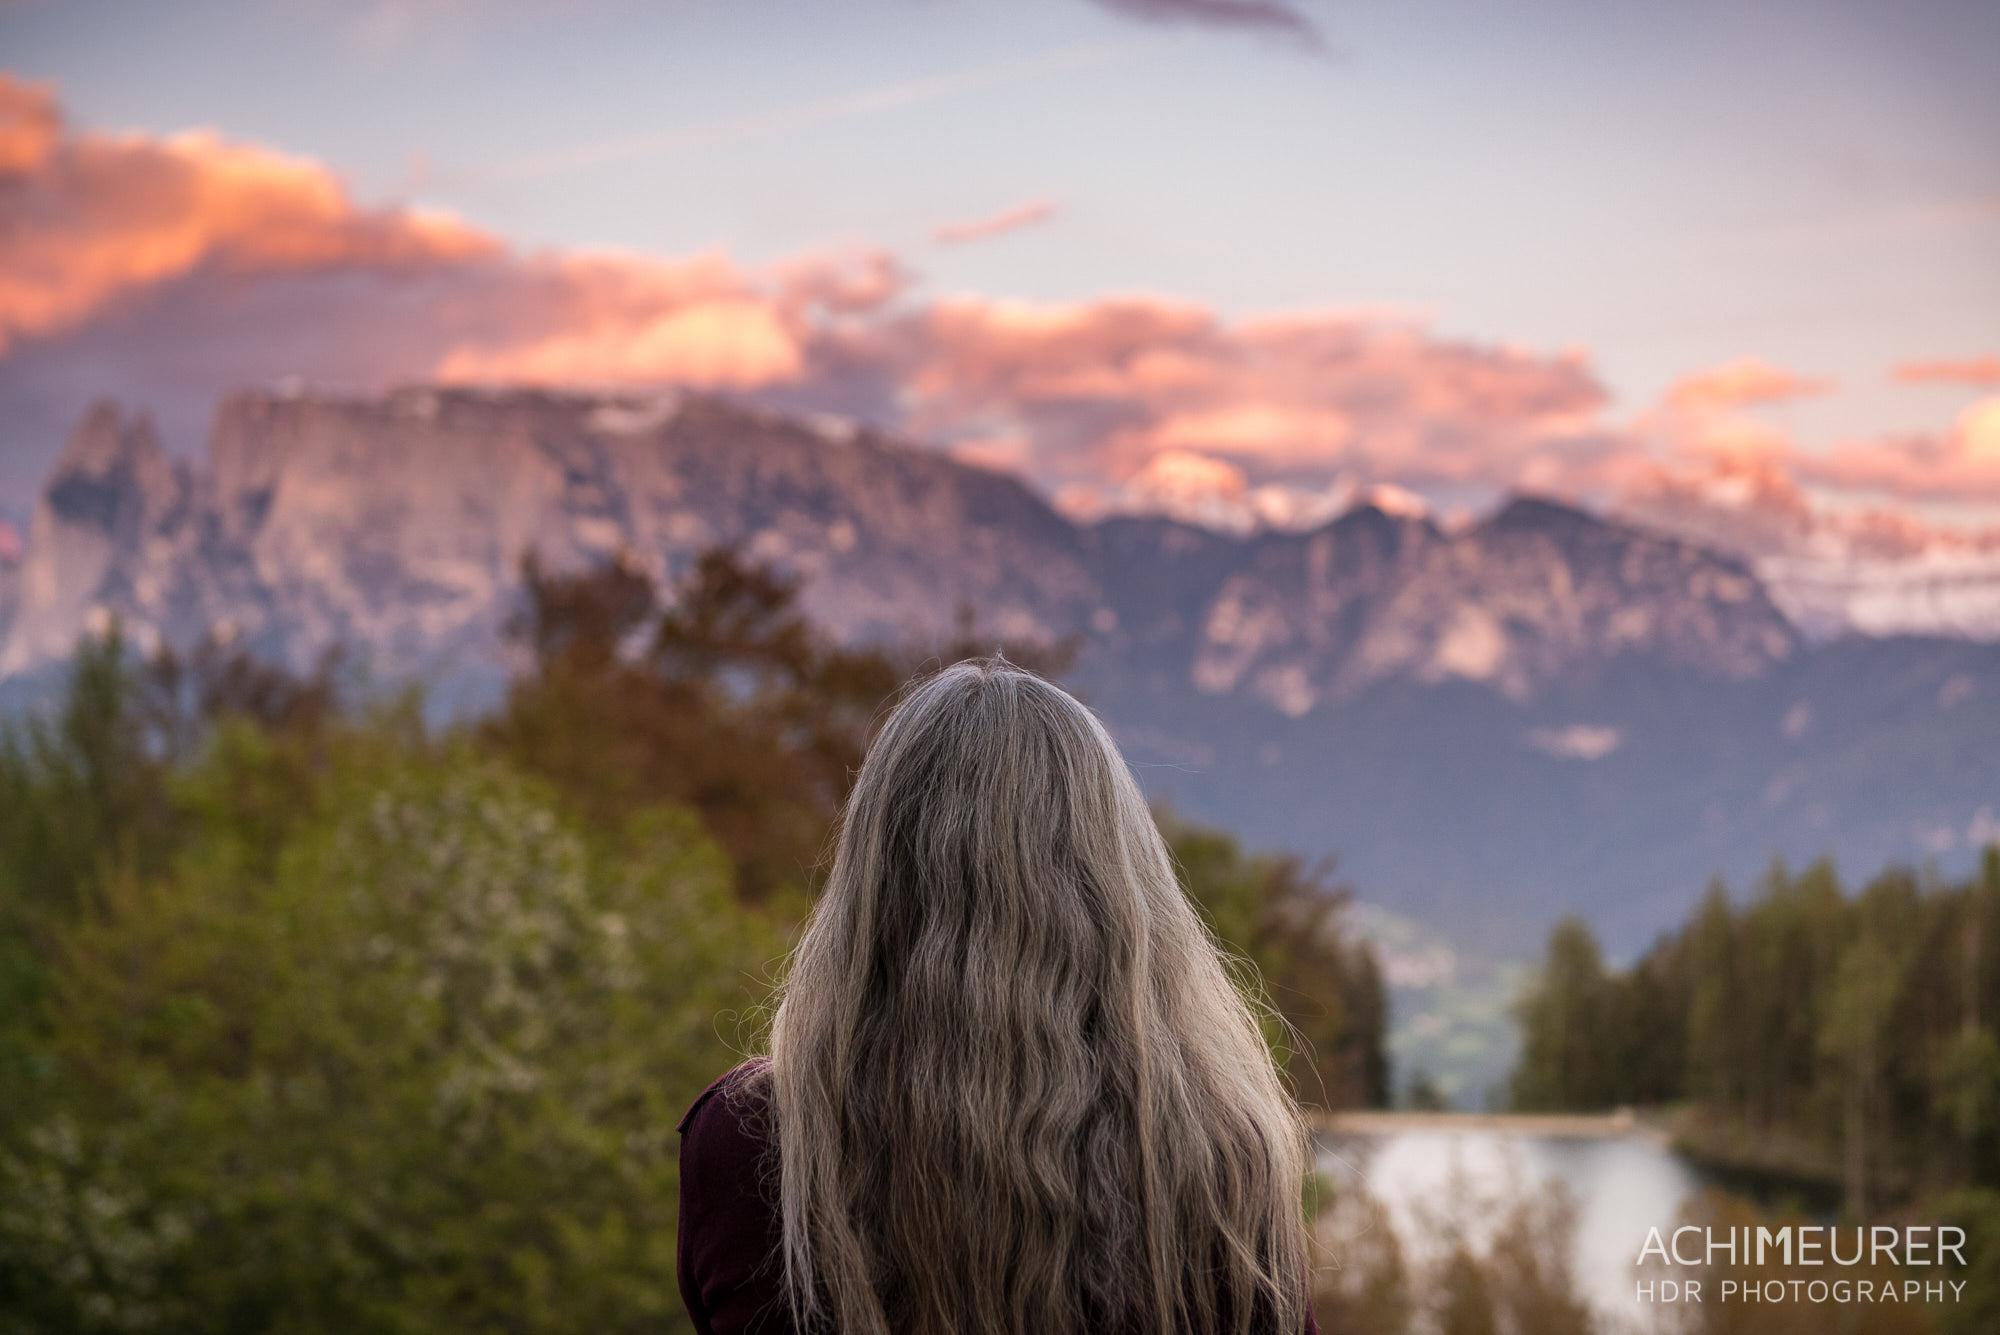 Monika schaut auf den glühenden Rosengarten, Ritten, Südtirol, Italien by Array.